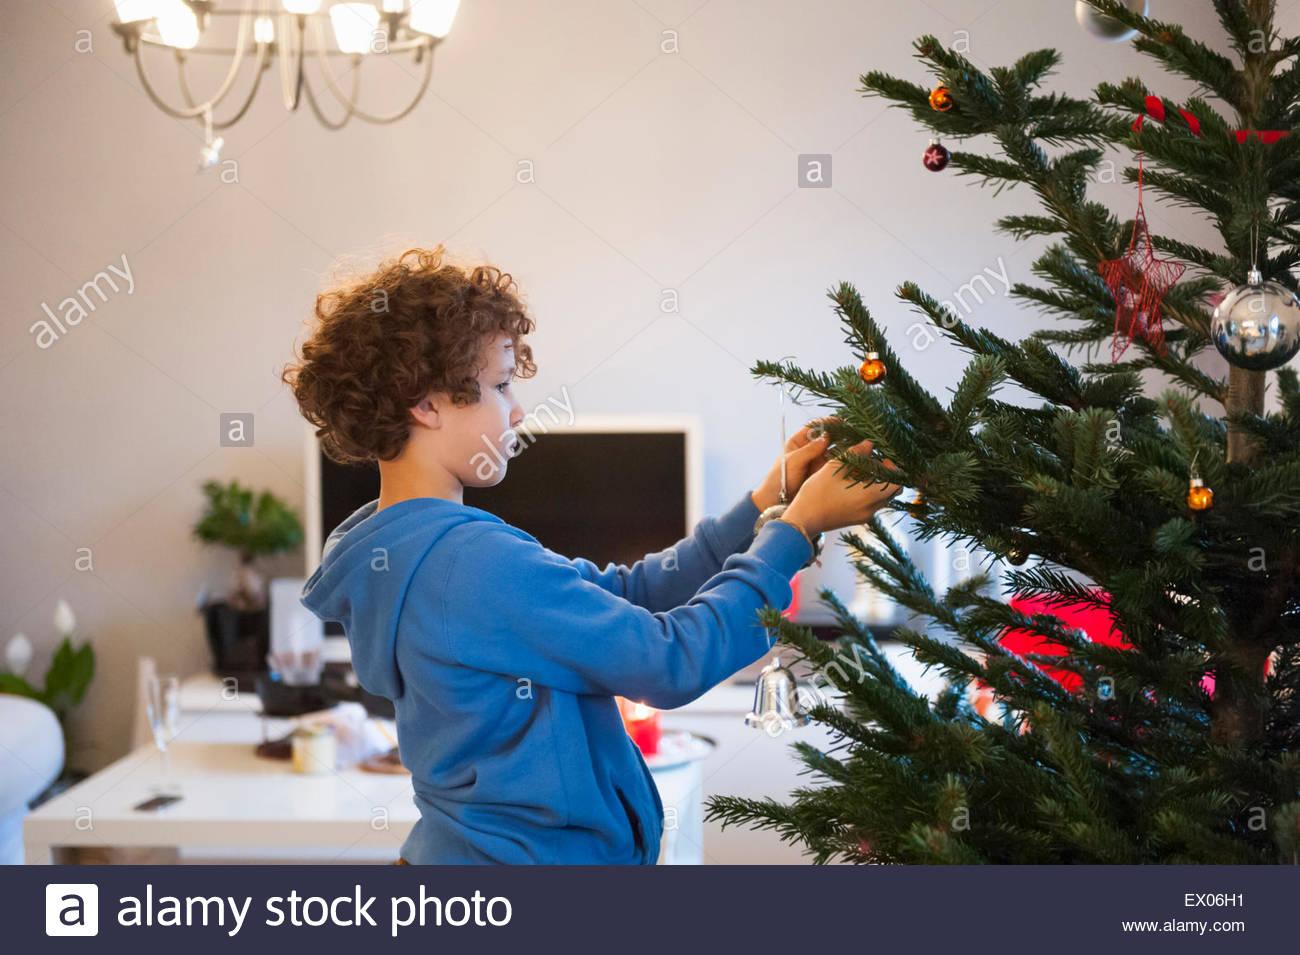 Boy hanging decorations on Christmas tree - Stock Image